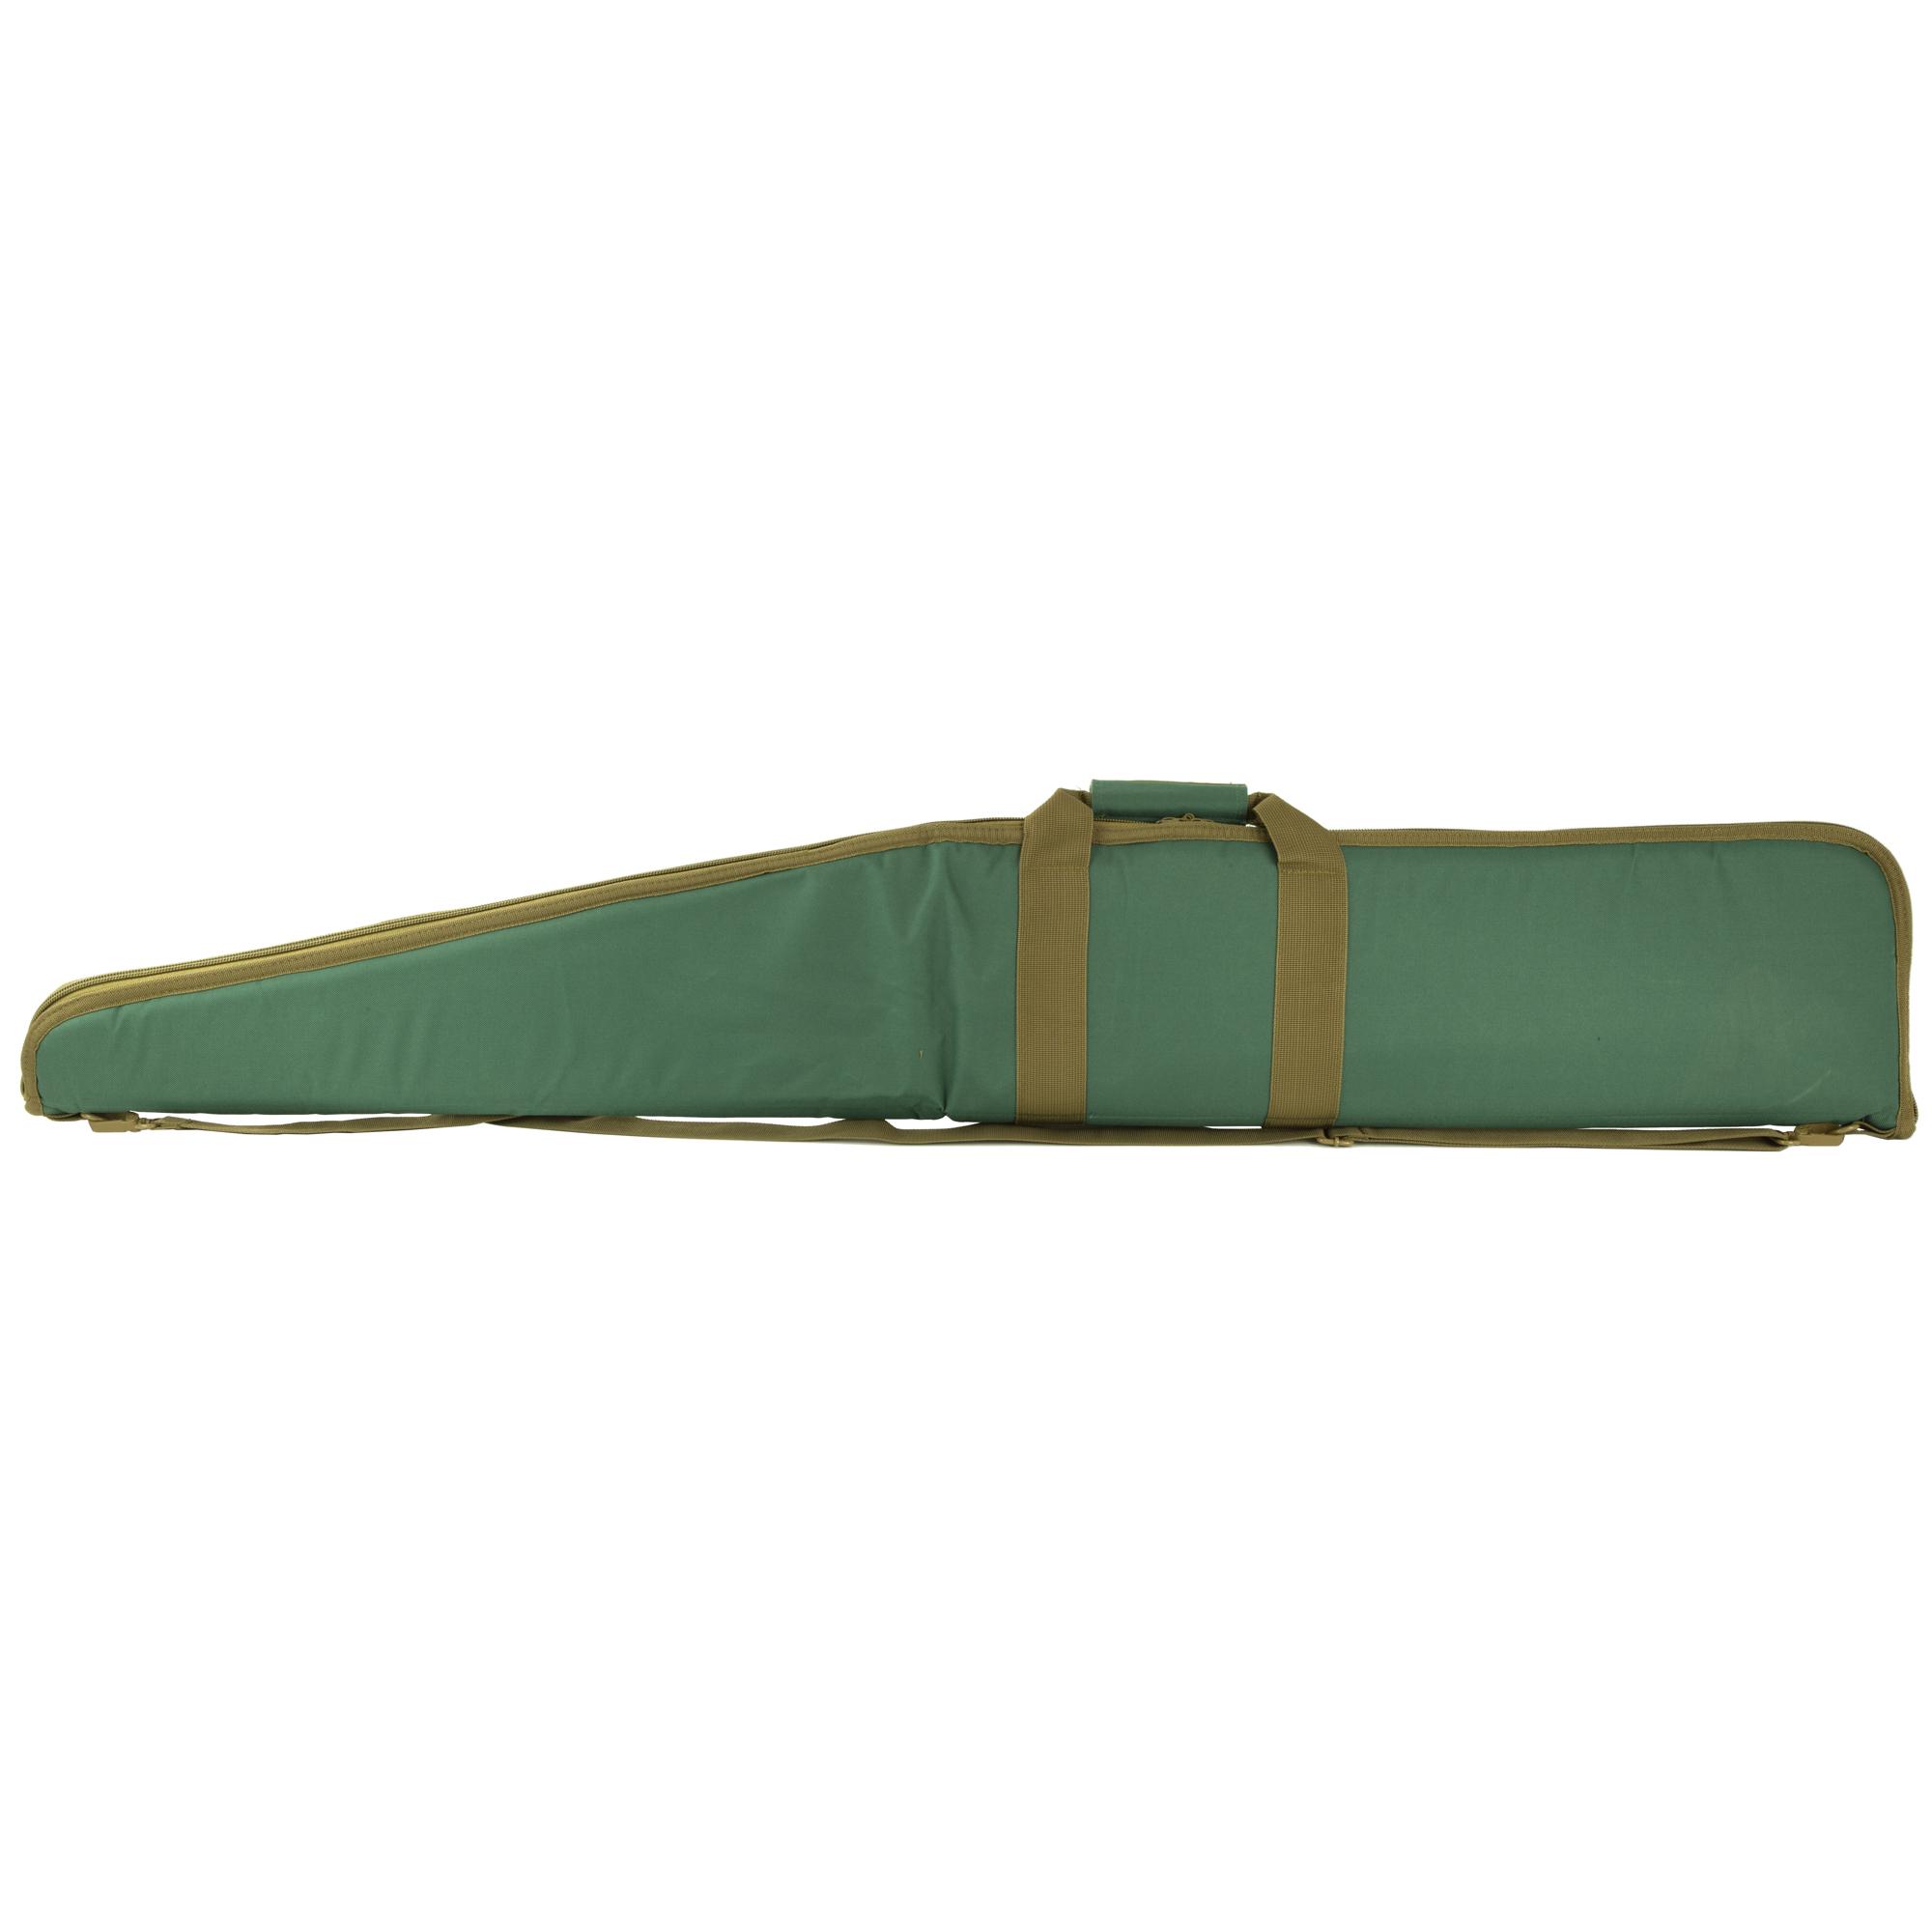 NCSTAR 2958 Series Shotgun Case Nylon 54″ – Green